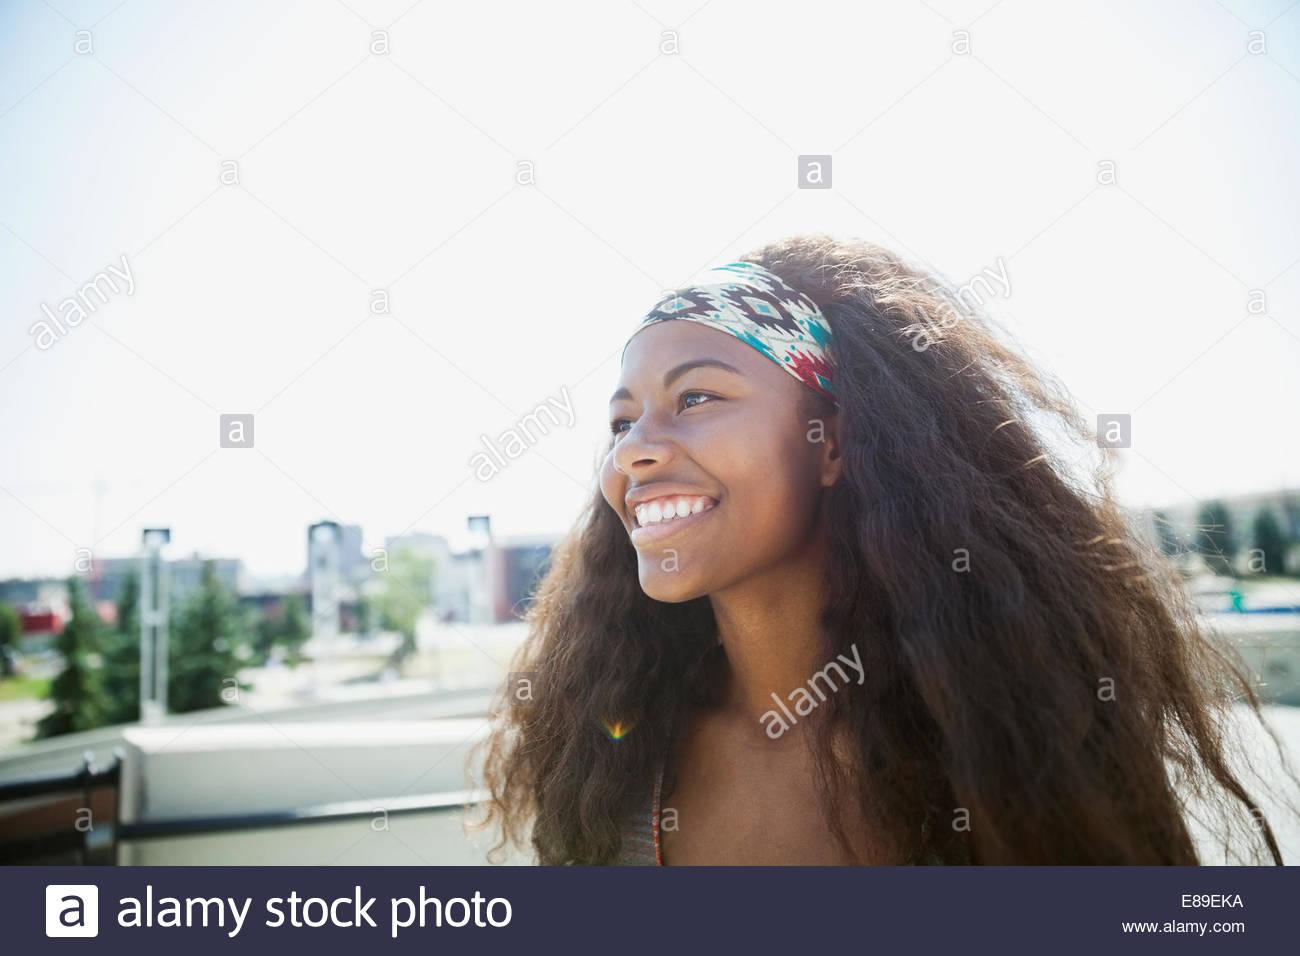 Teenage girl smiling outdoors - Stock Image